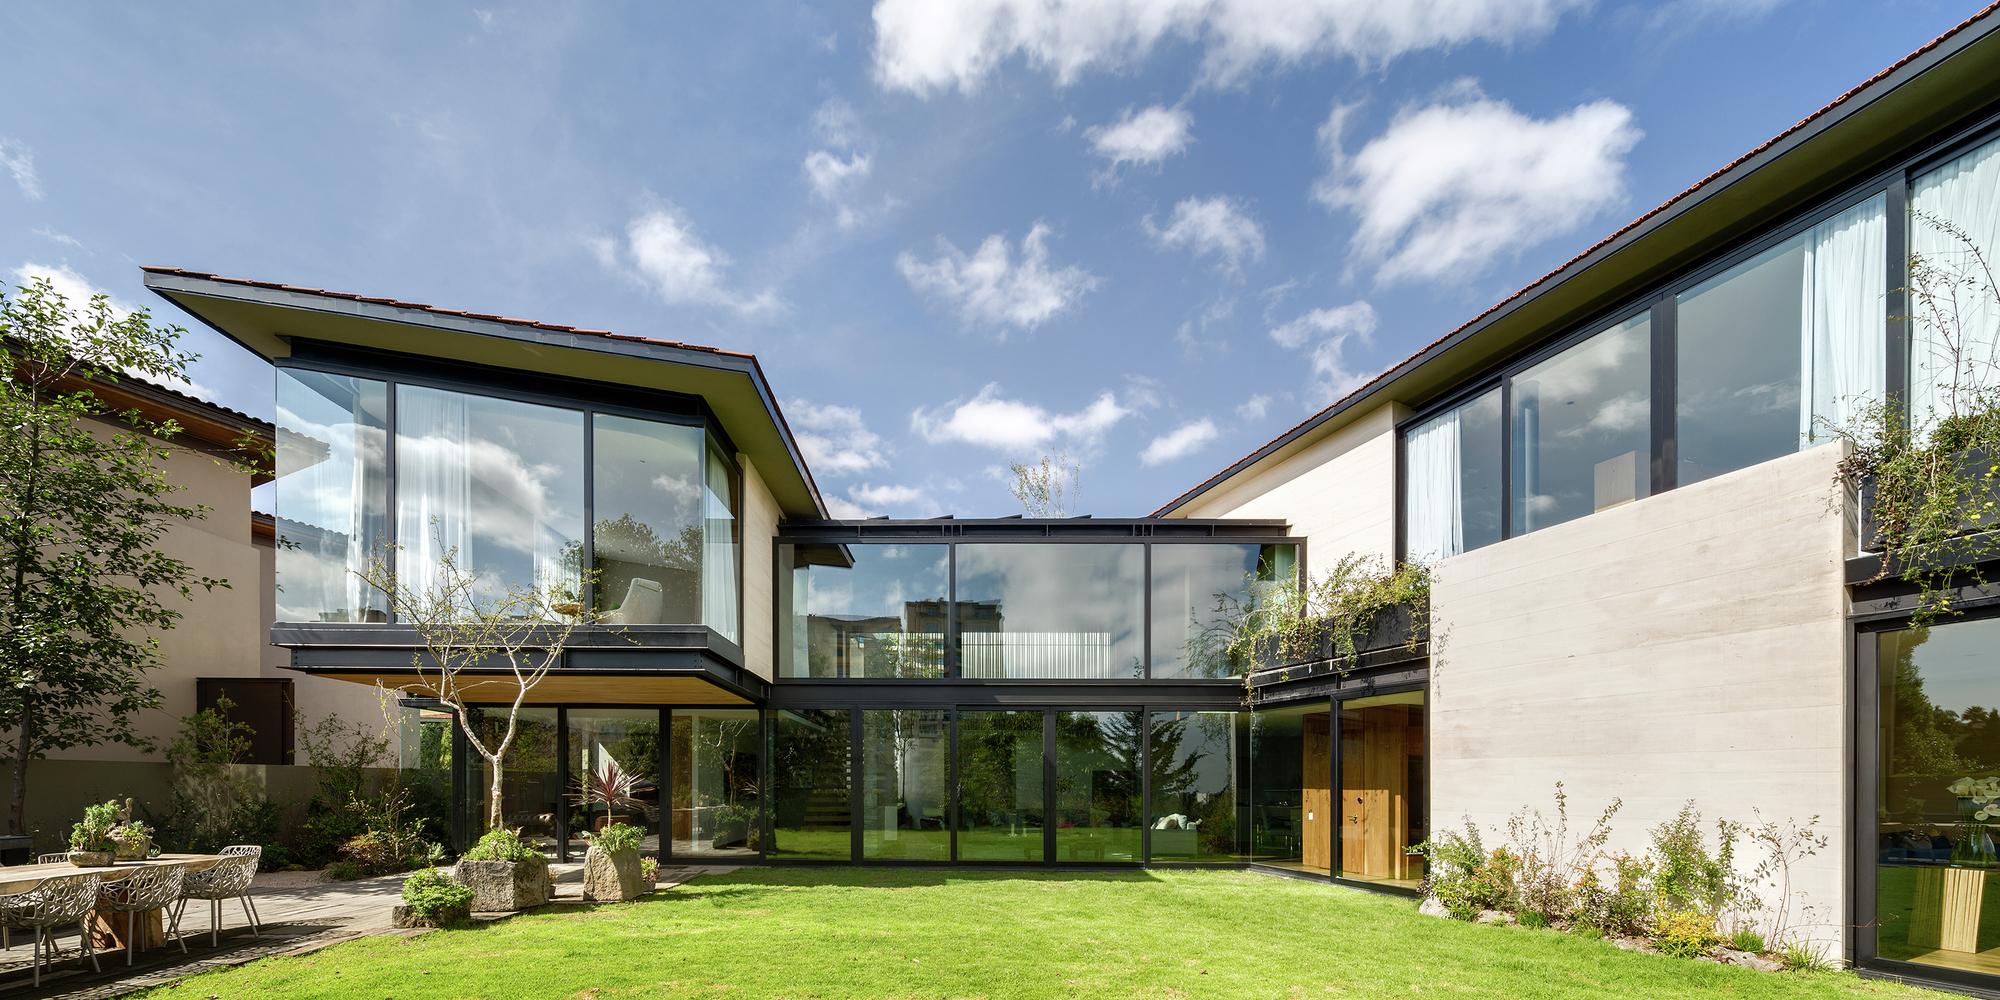 Casa v9 vgz arquitectura y dise o archdaily m xico - Arquitectura y diseno ...